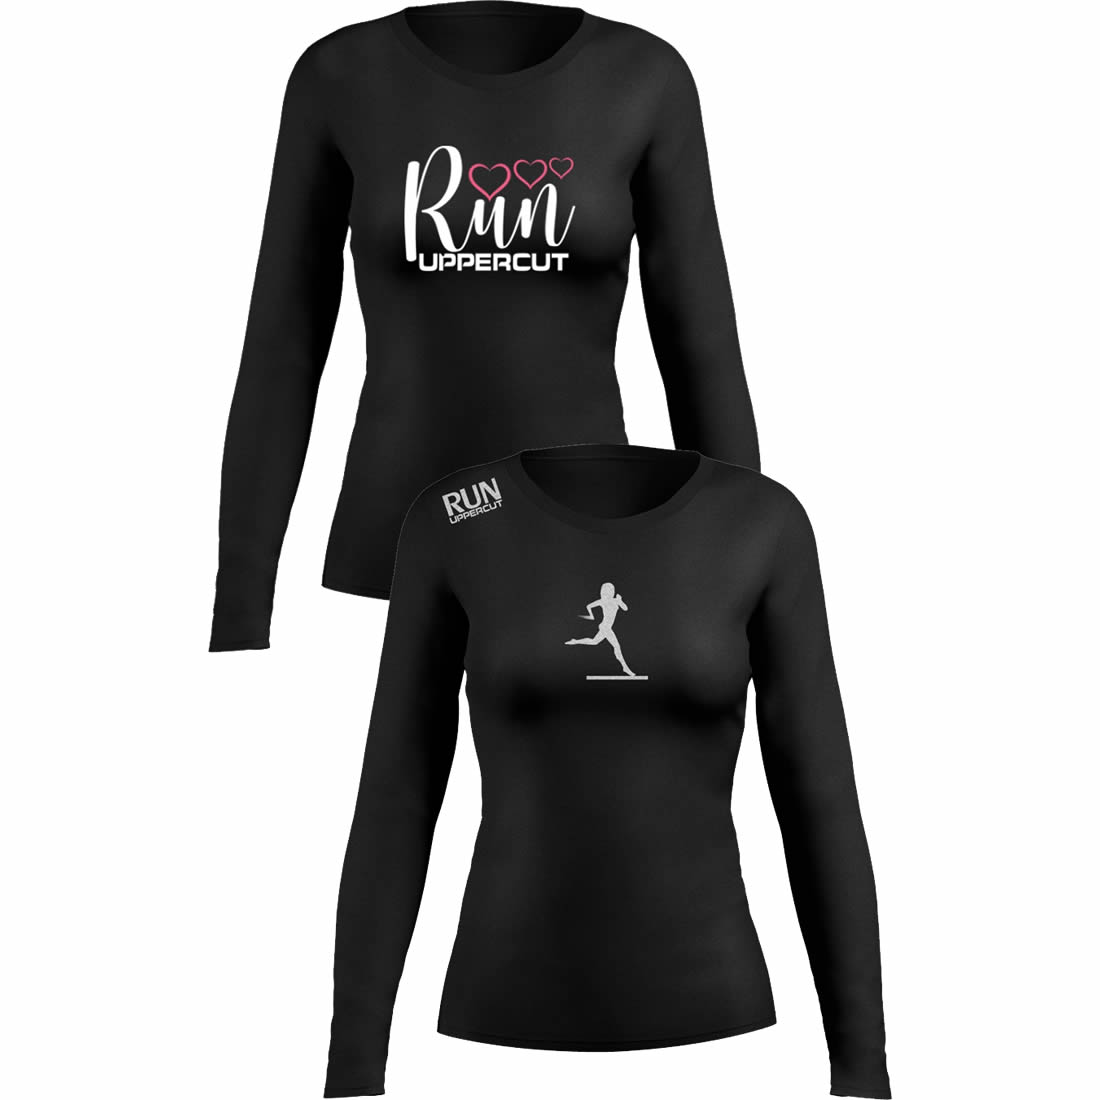 Kit 2 Camisas UV-50+ - Corrida Running Feminina - Kt05